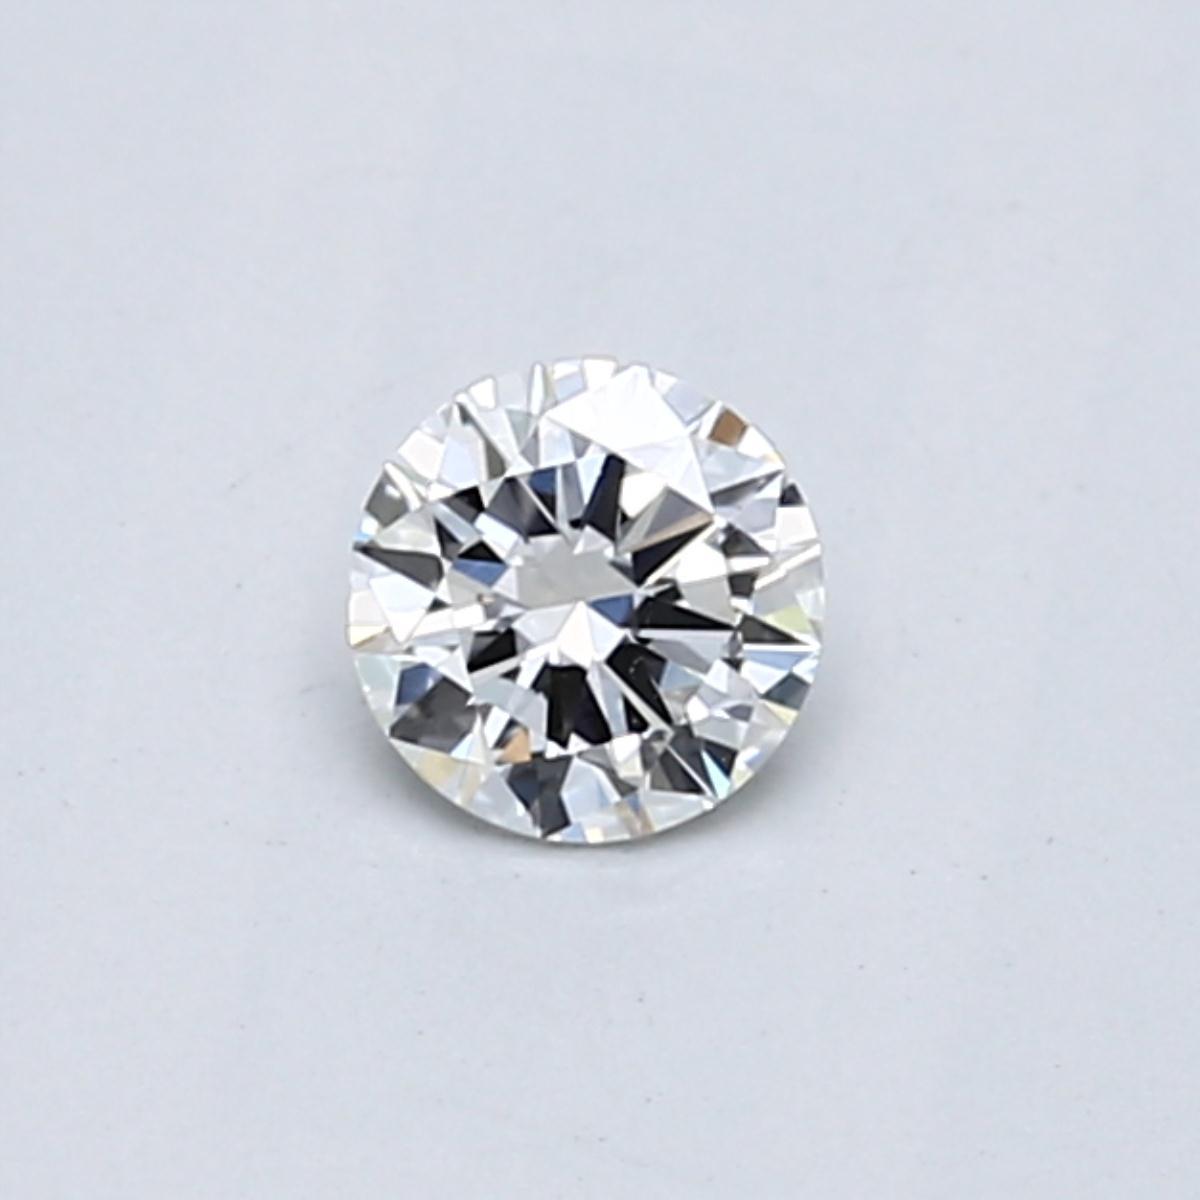 .30 carat Round Diamond, Very Good cut, graded by the GIA laboratories.